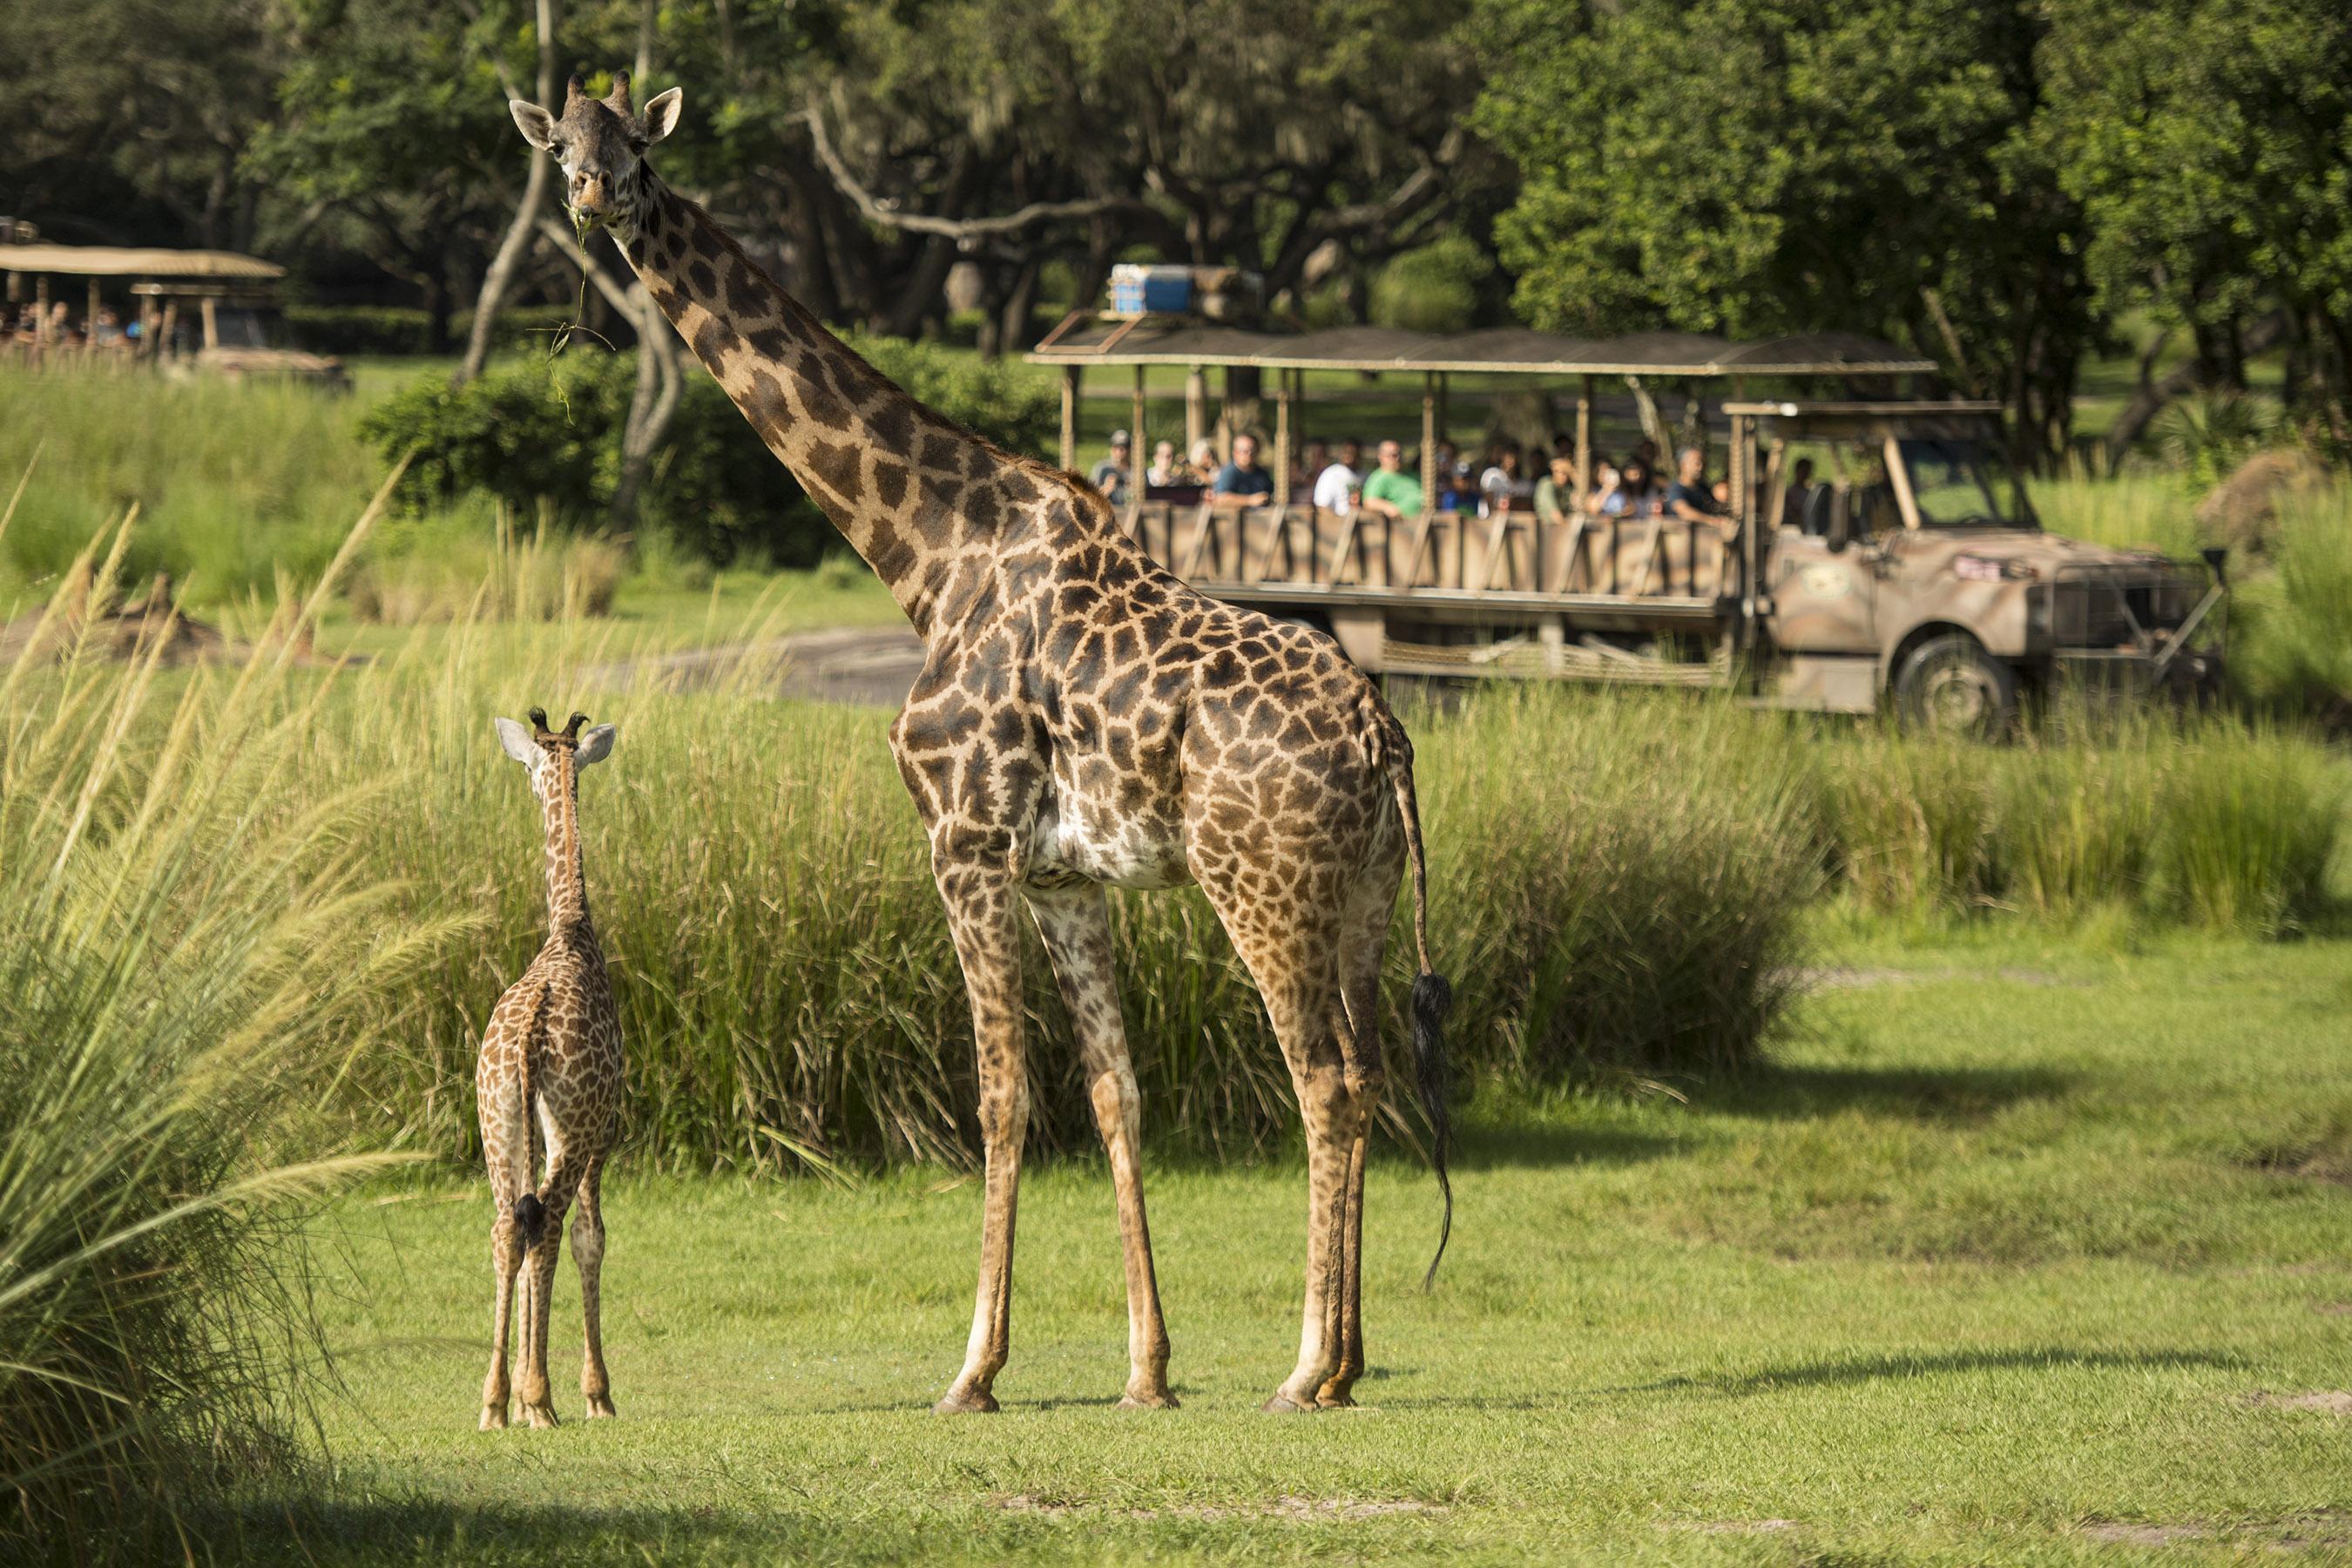 Aella the Masai giraffe calf